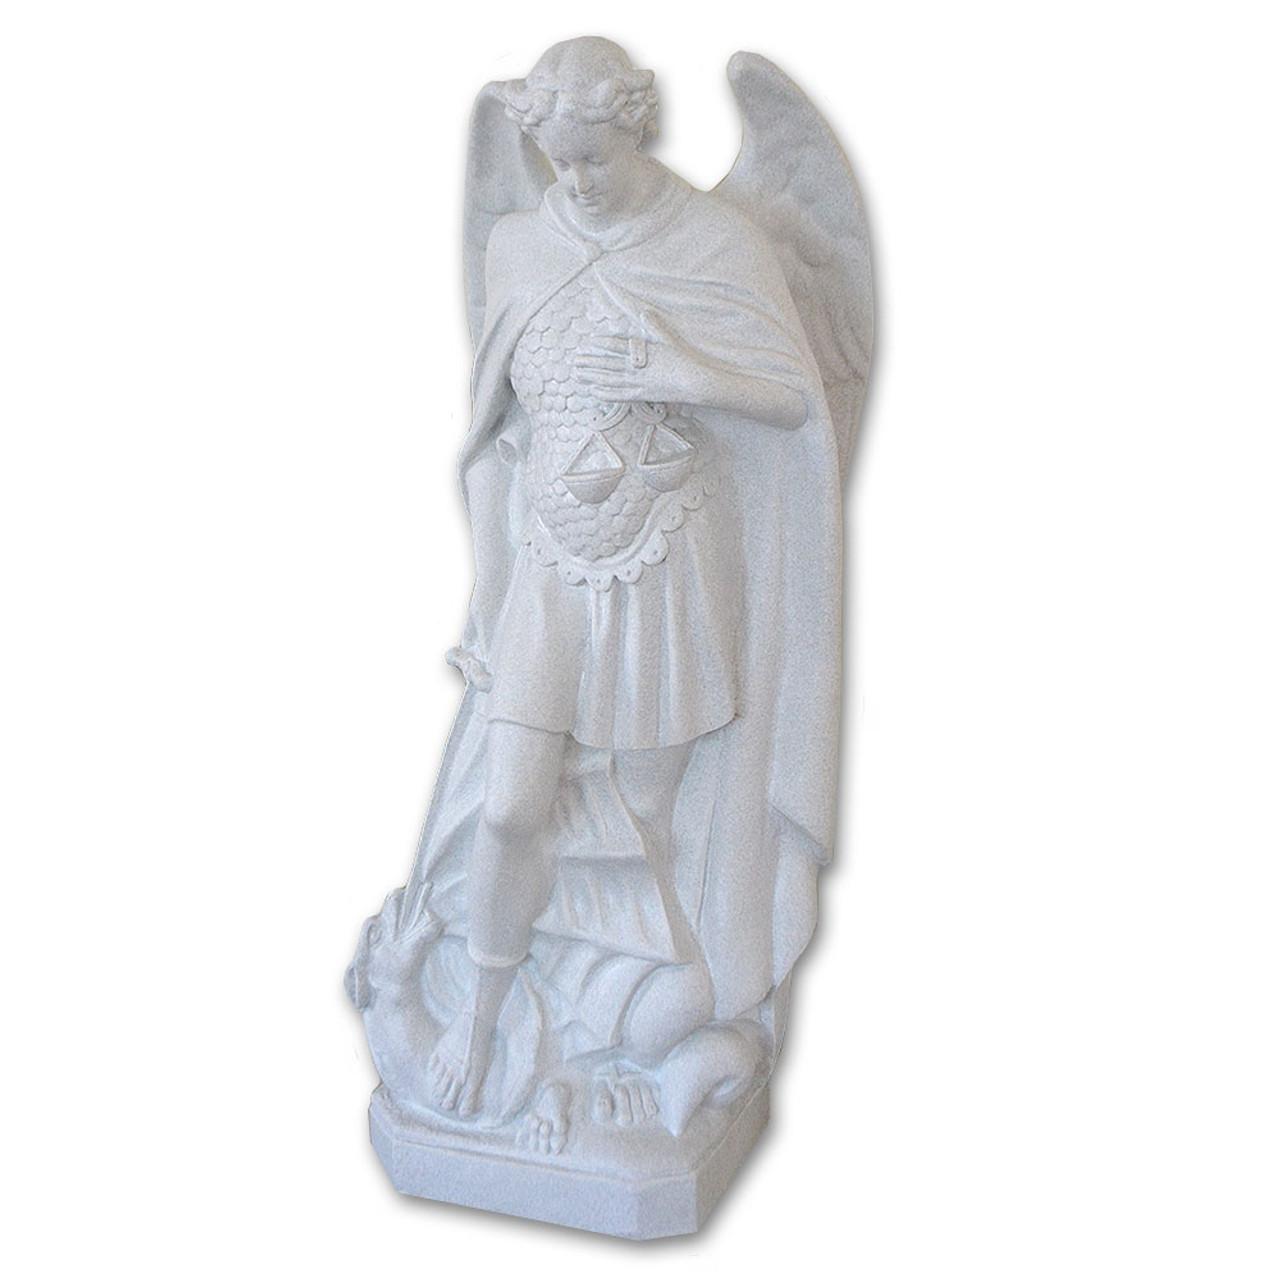 St. Michael Archangel Granite Finish Statue